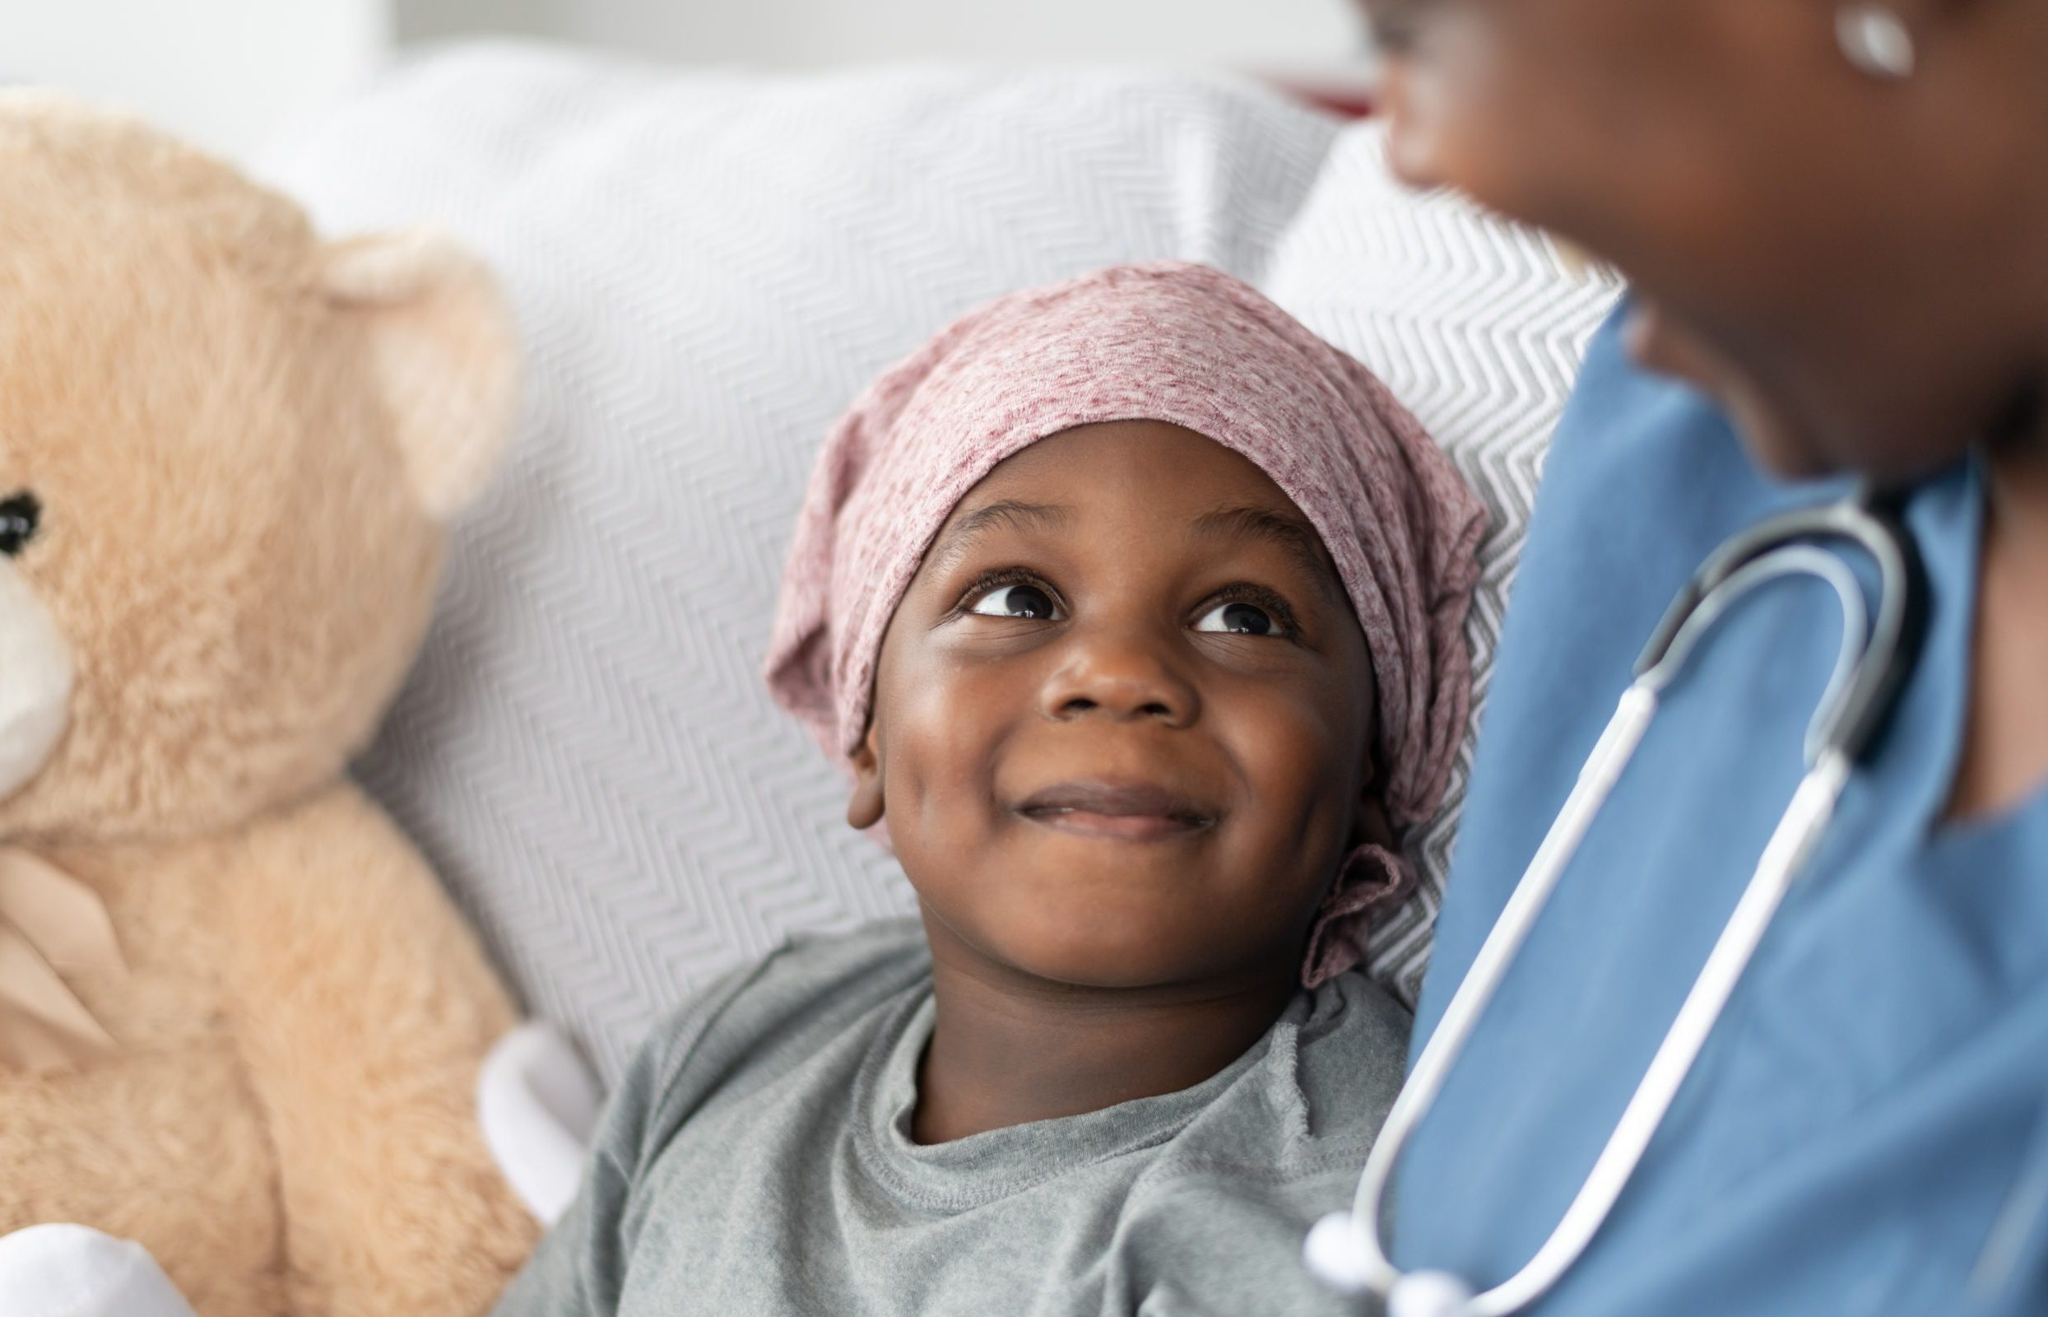 local pediatrician in littleton